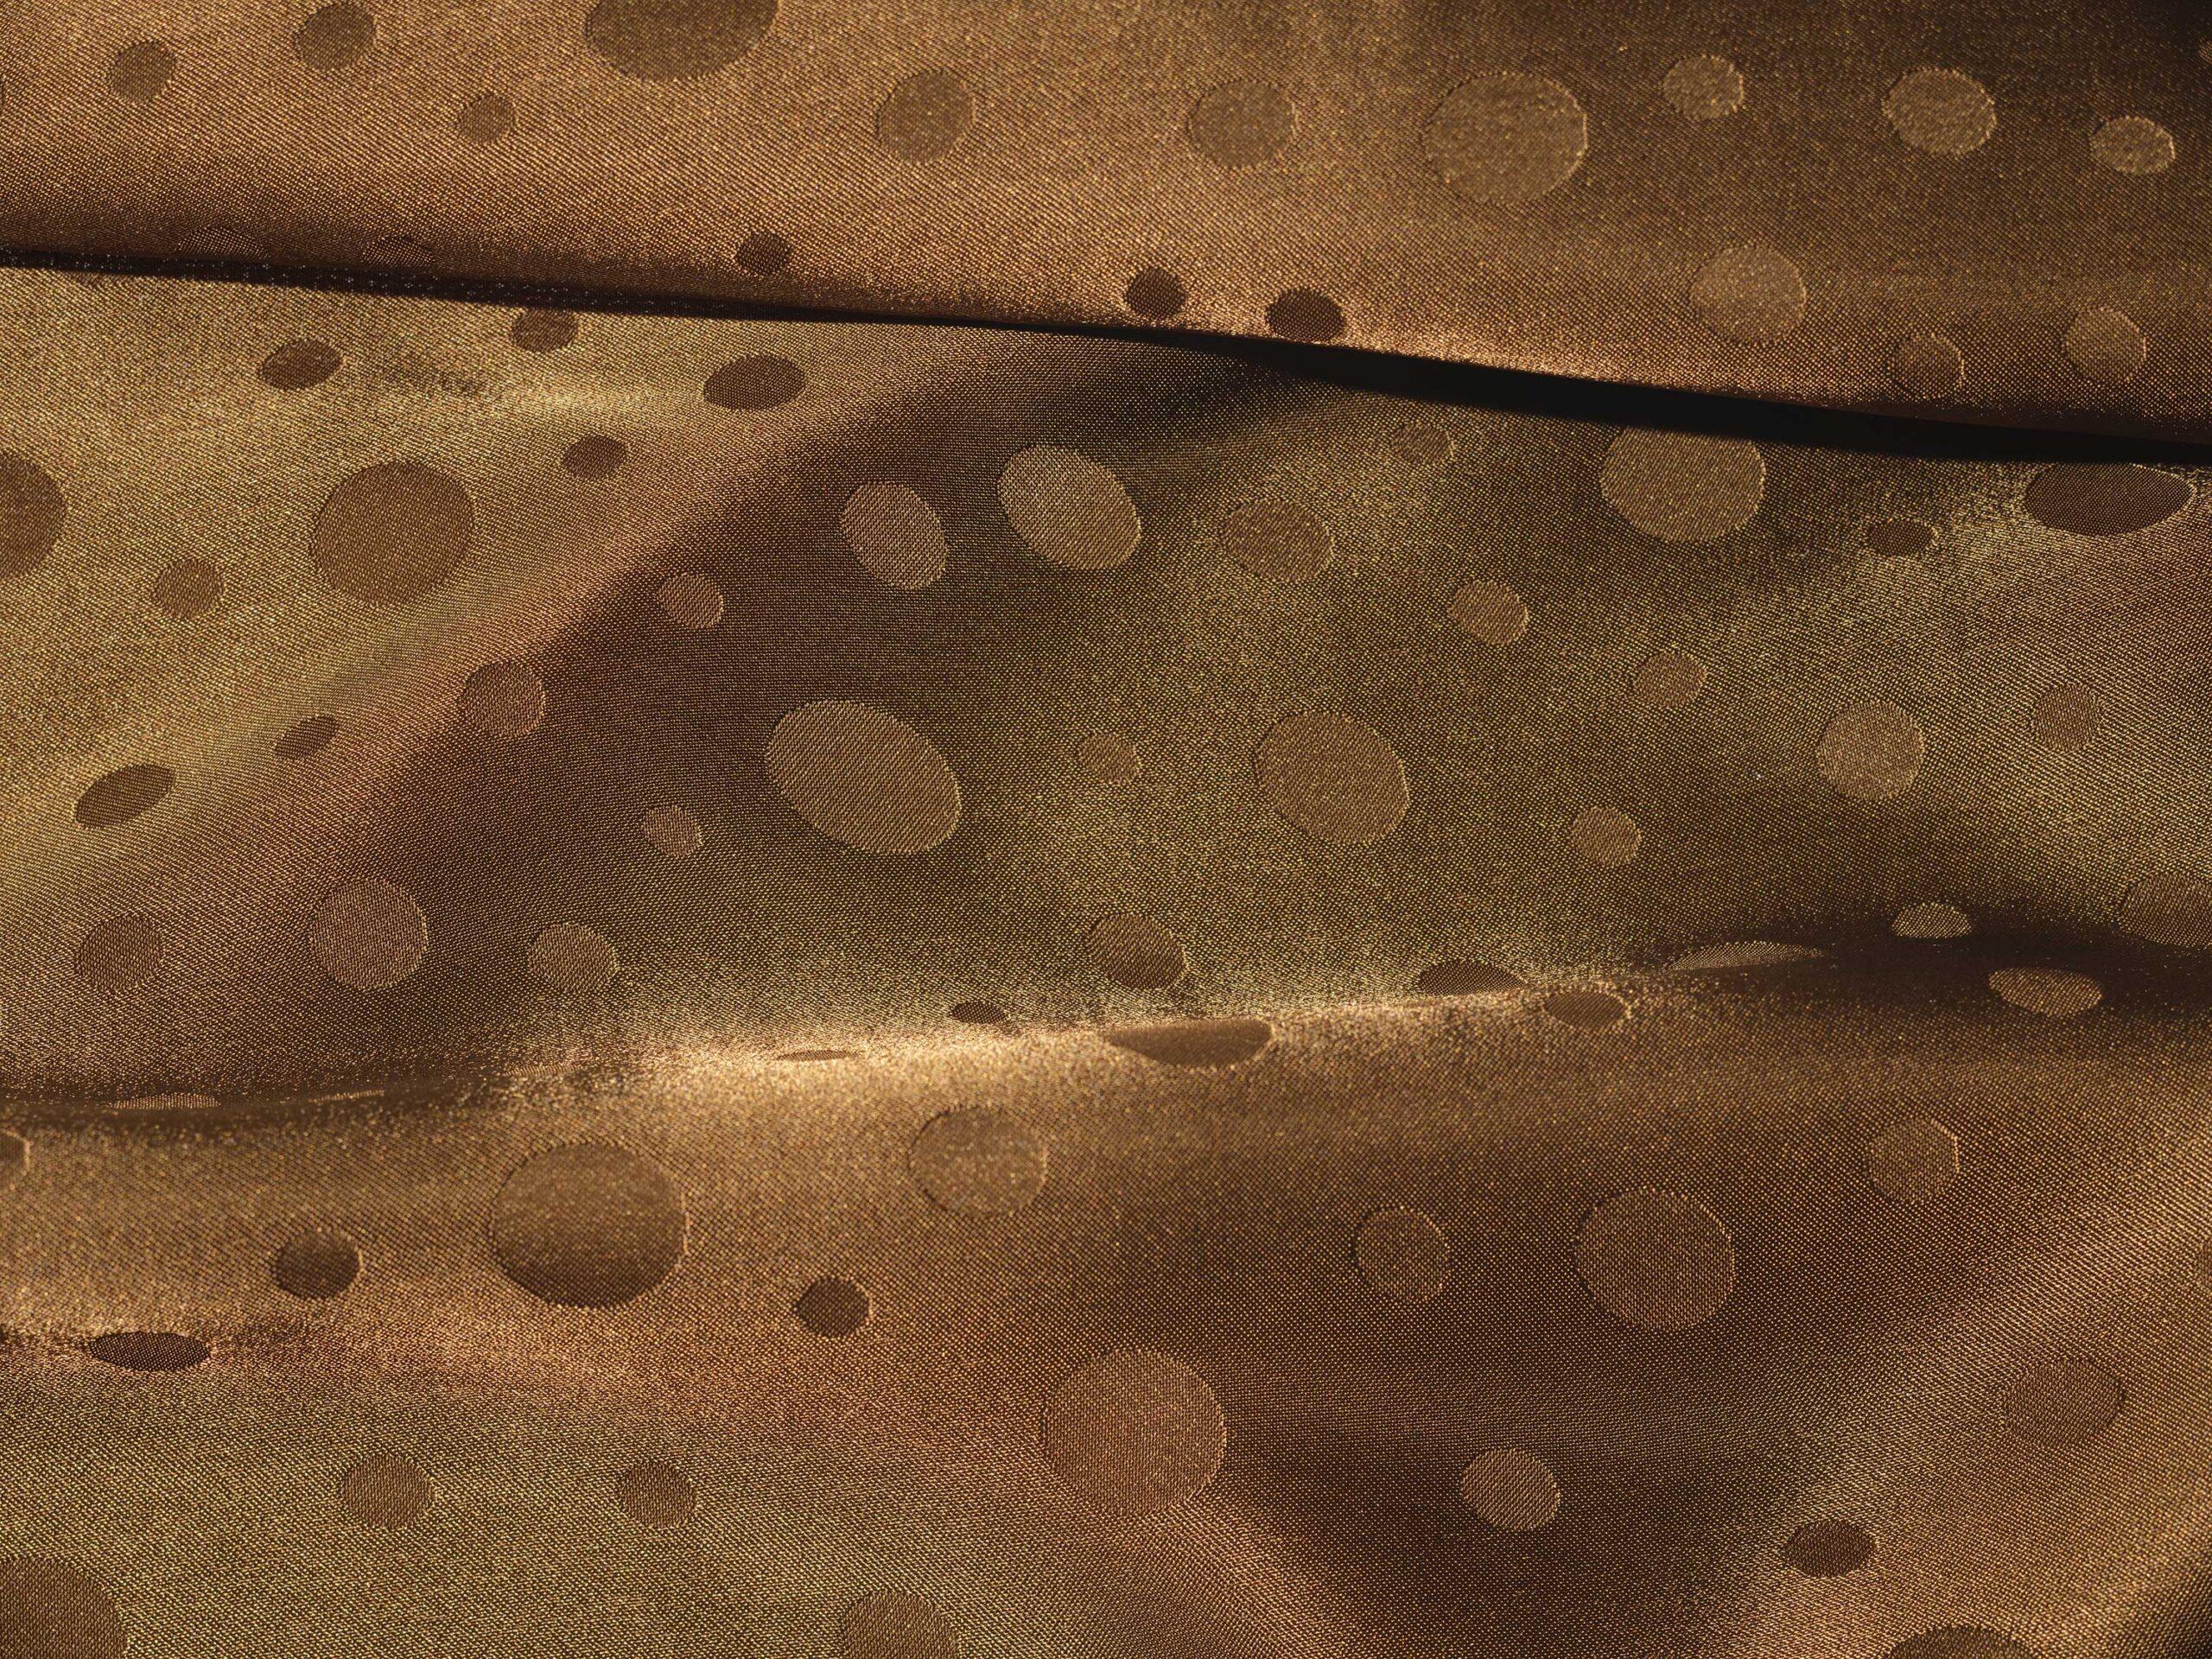 SITUSSA SATIN JACQUARD DIS. POIS ART.R929 Image